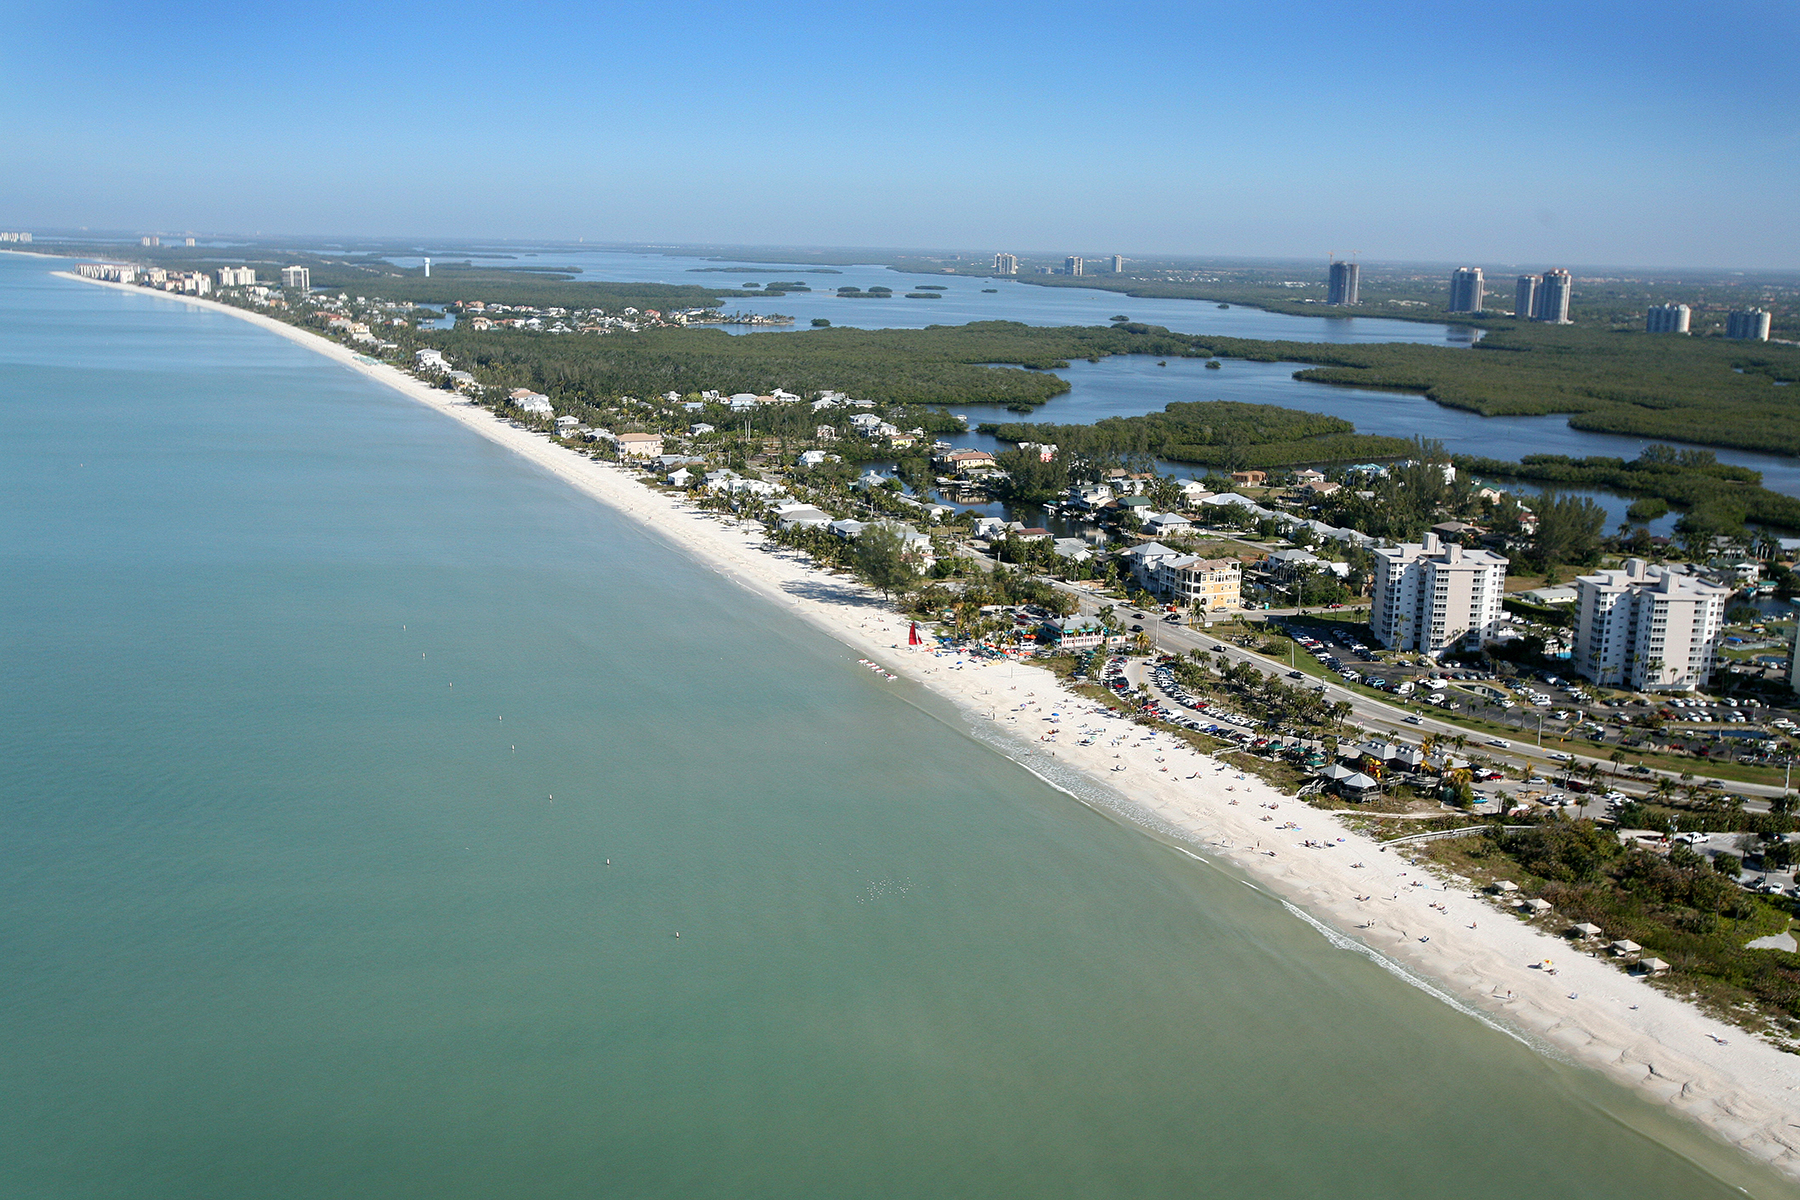 Land for Sale at RIVIERA COLONY 3665 Riviera Cir Bonita Springs, Florida, 34134 United States